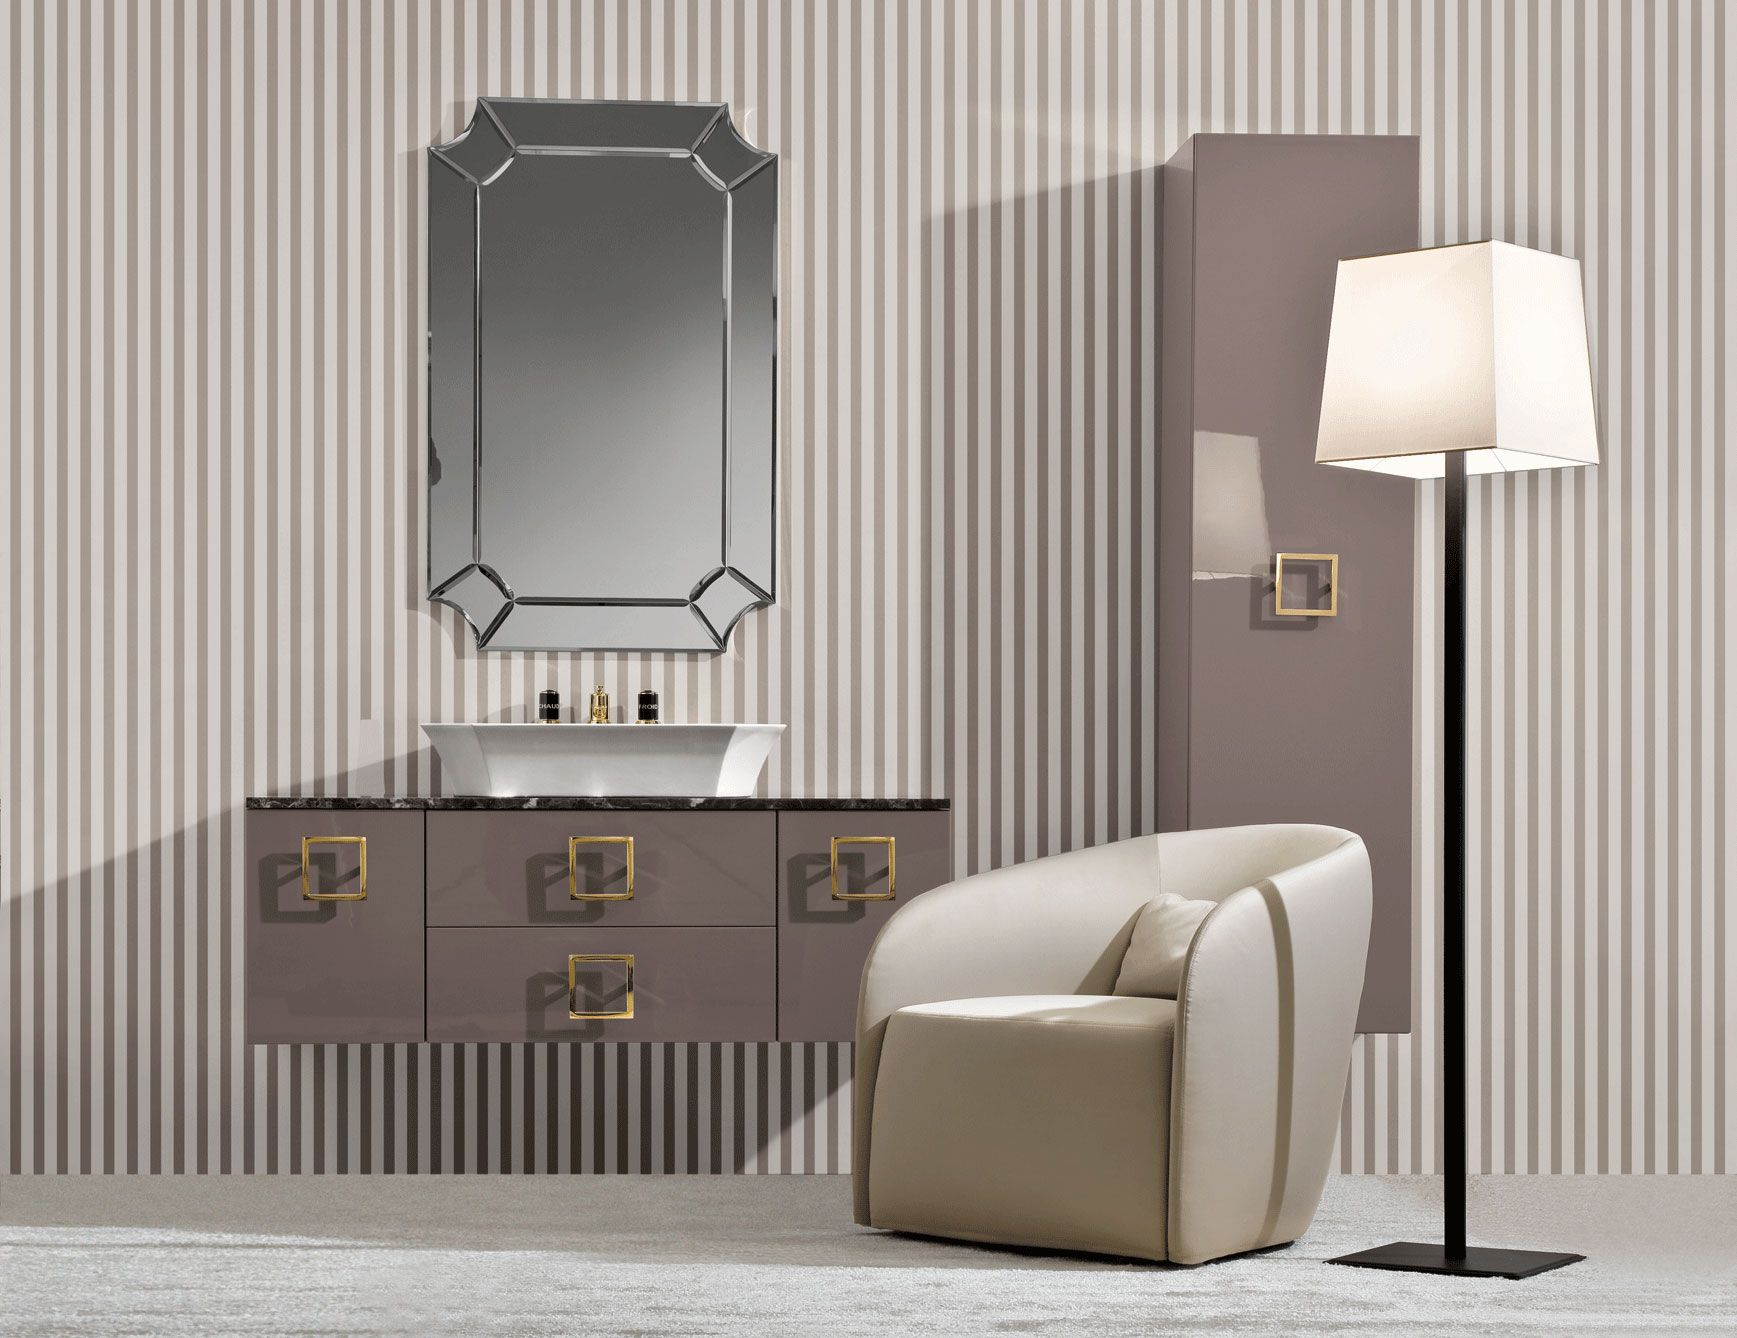 Contemporary Bathroom Vanity Chairs And Stools Of Daphne D13 Amazing Bathroom Vanities Luxury Design Decoration